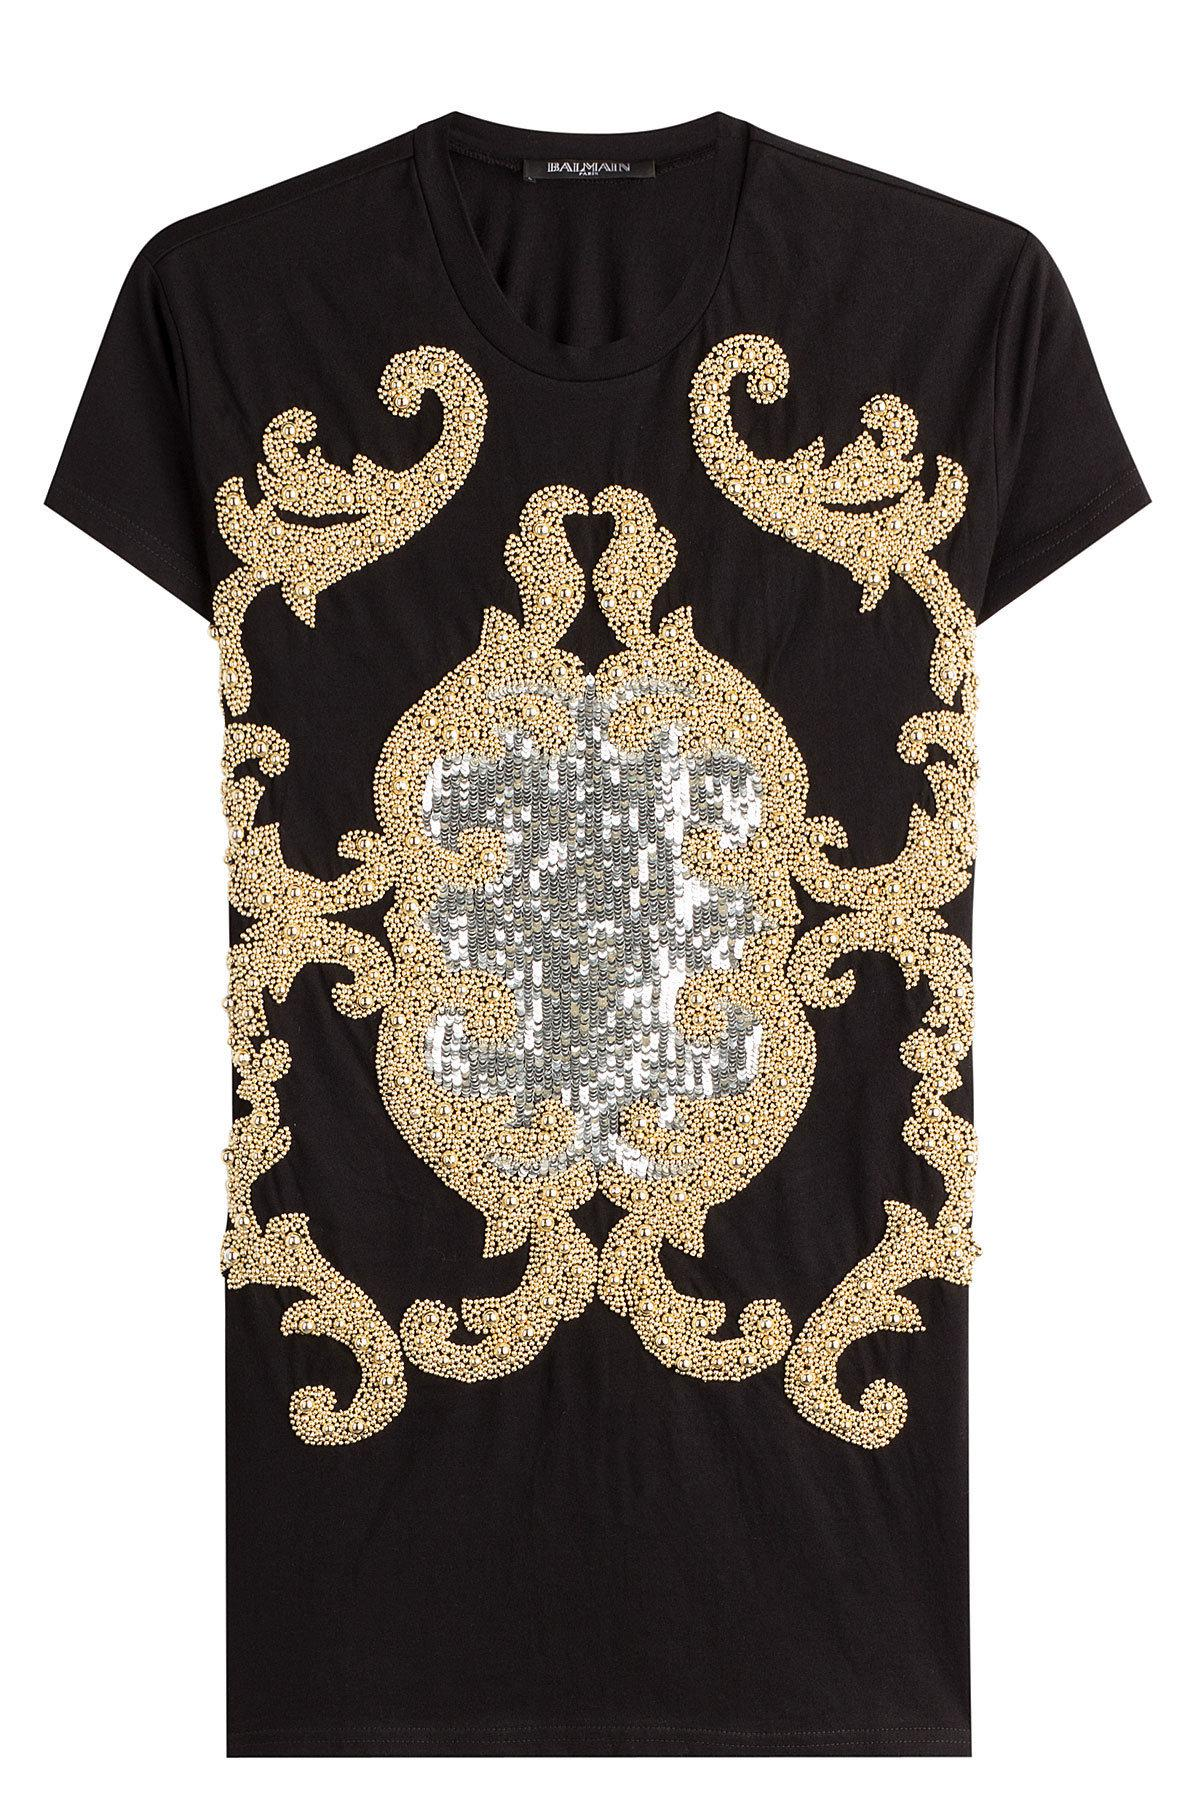 18d380e90 Lyst - Balmain Embellished Cotton T-shirt in Black